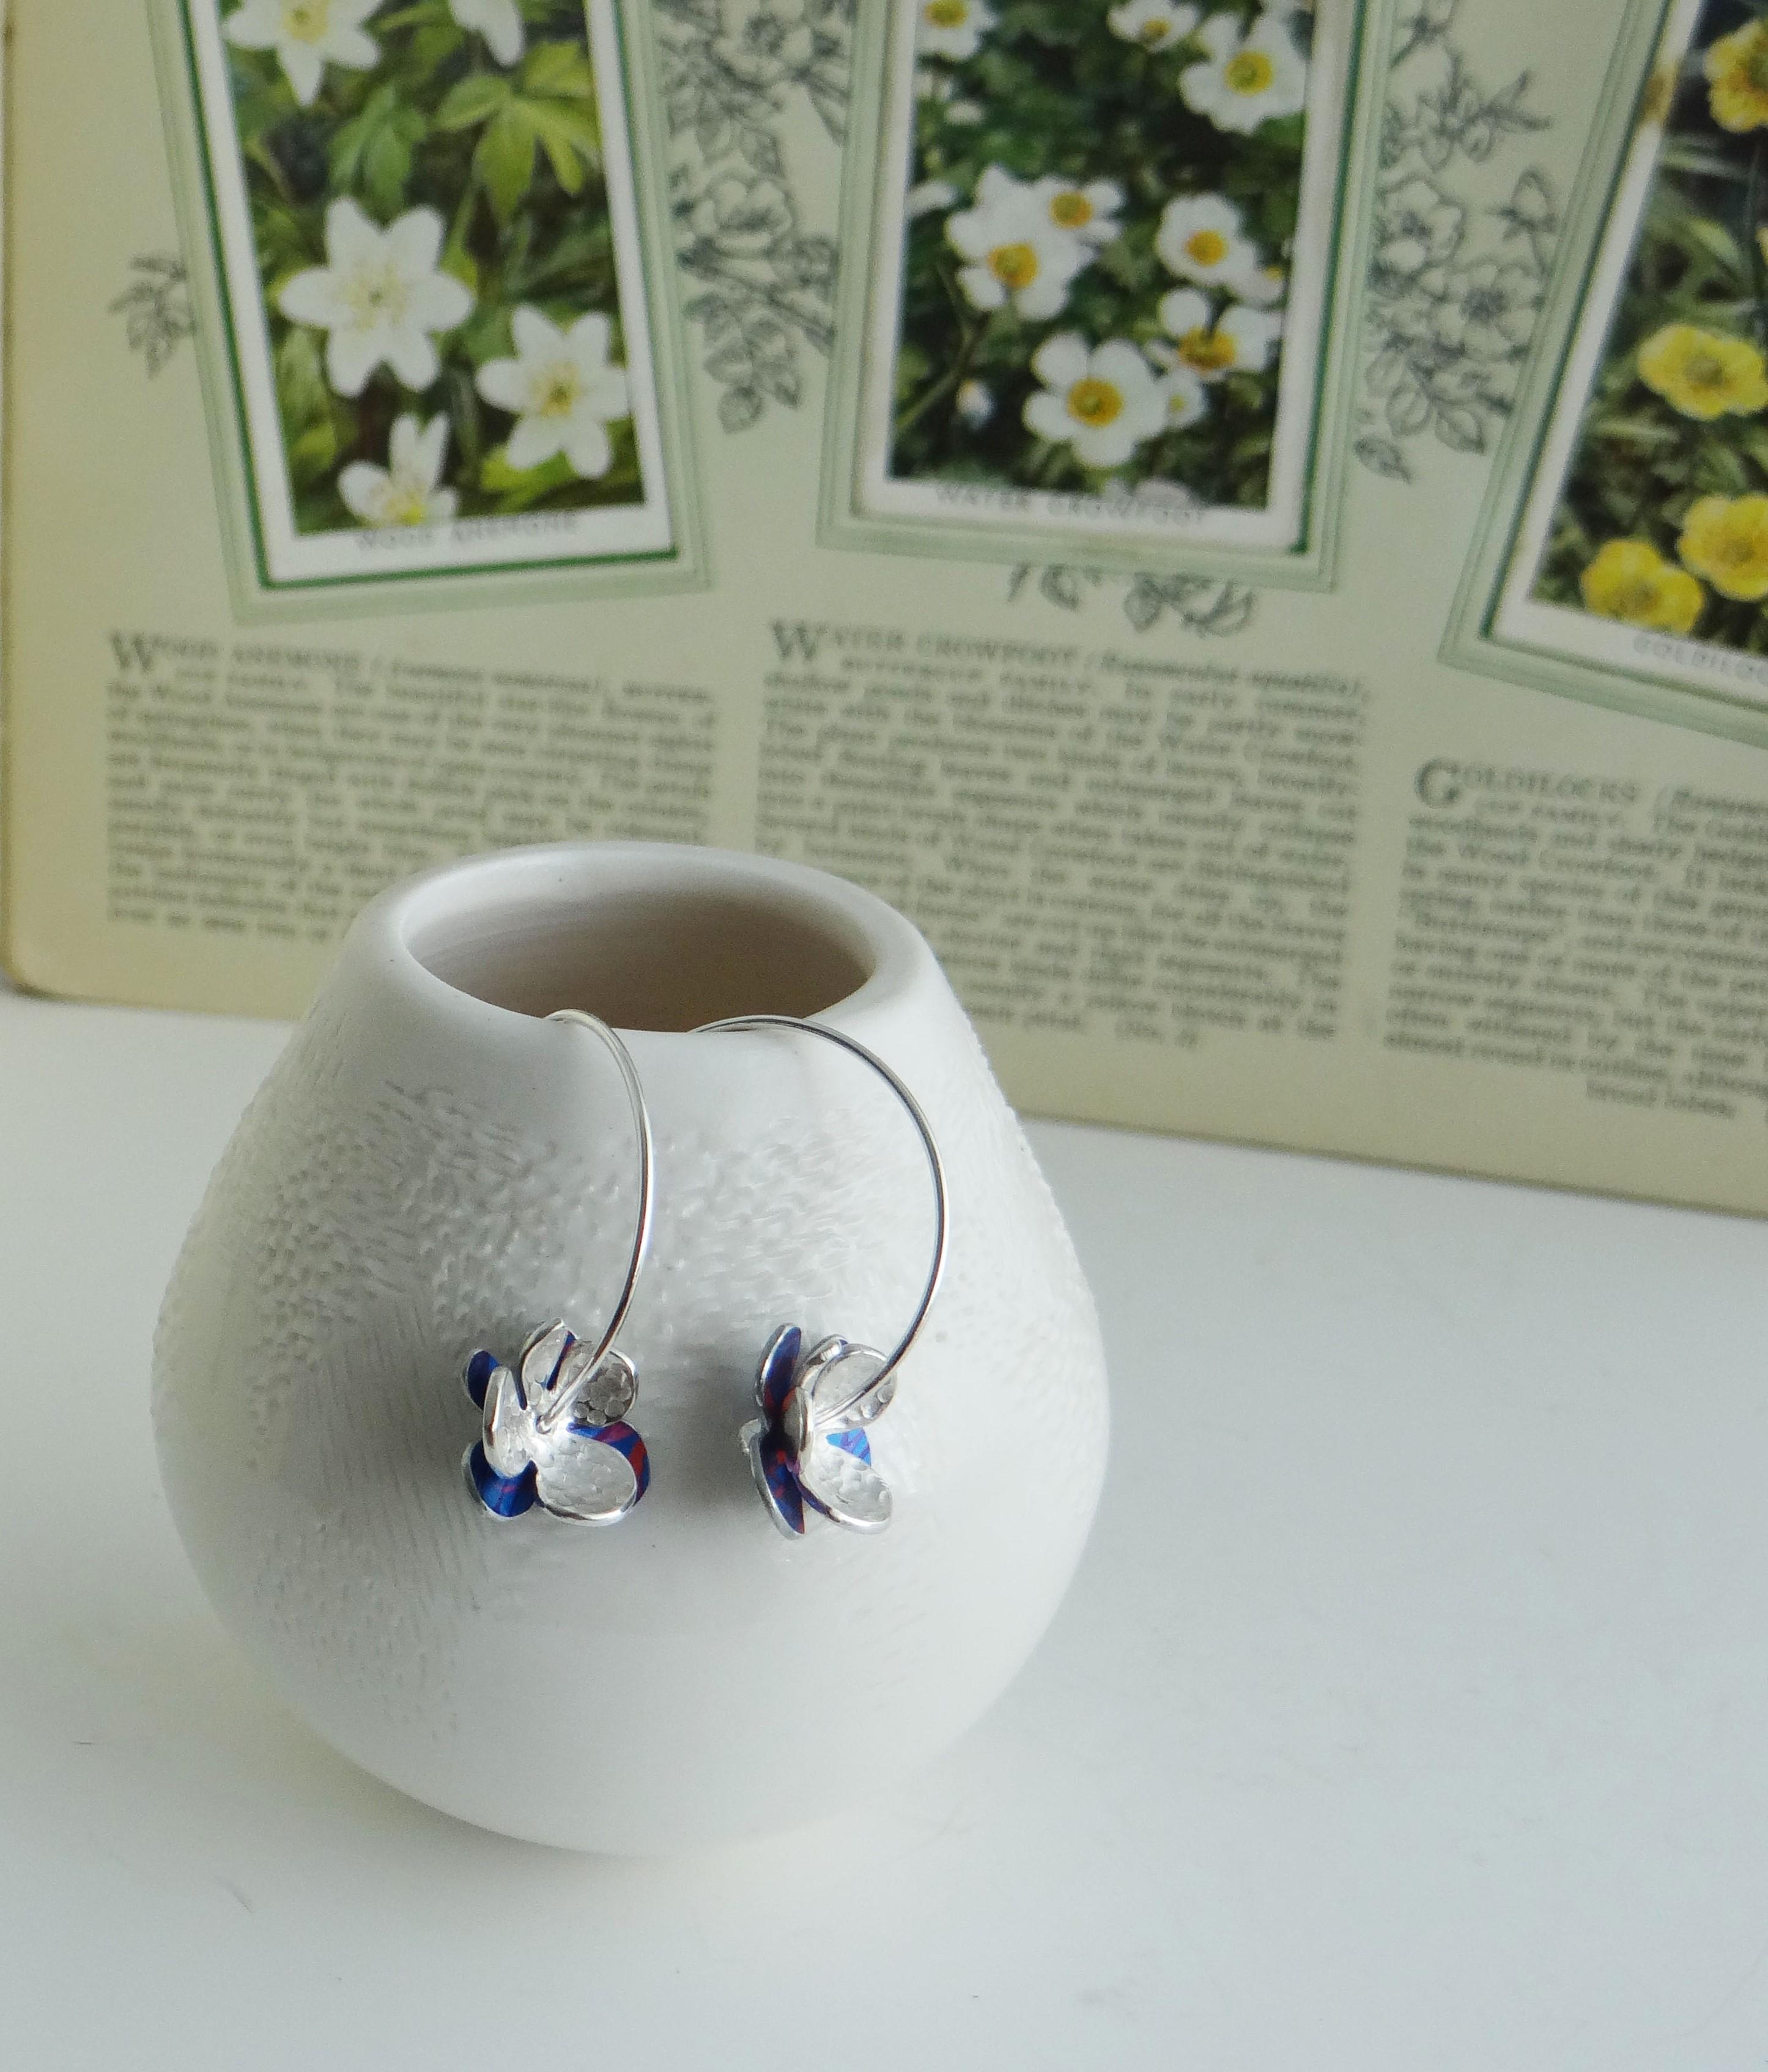 Sheila Roussel Jewellery Design